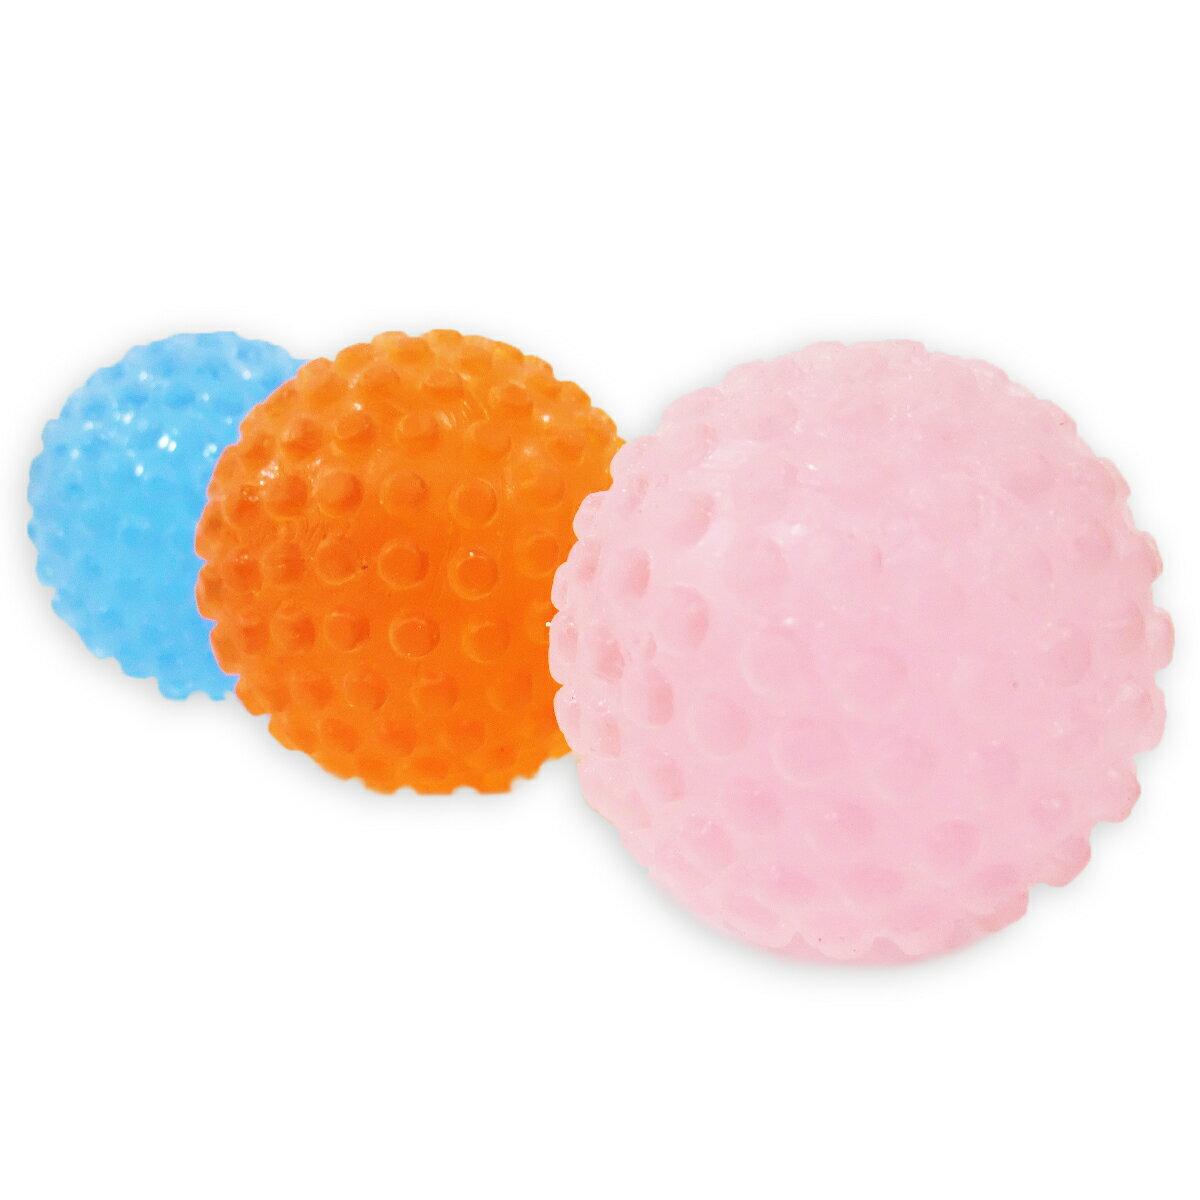 HYGIEIA 許癸厄亞 D07025 圓形顆粒握力球 (3色)